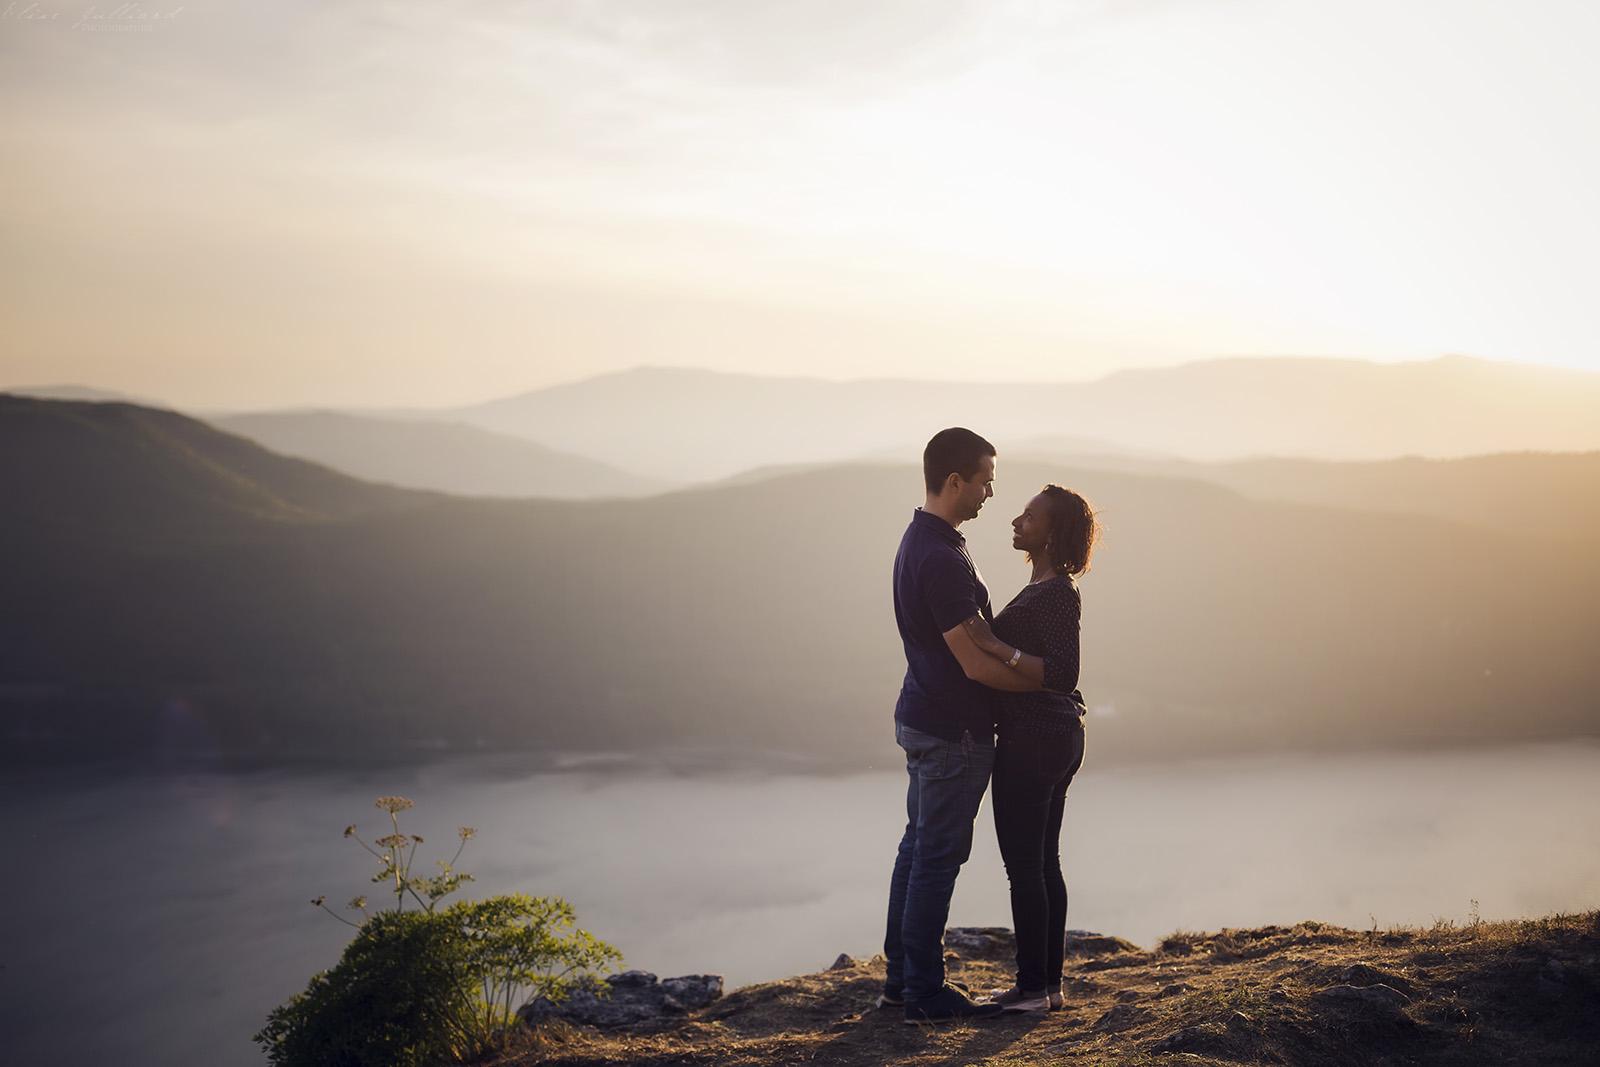 elise-julliard-photographe-lyon-rhone-alpes-mariage-amour-seance-photo-engagement-couple-love-session-wedding-lac-du-bourget-chambery-7